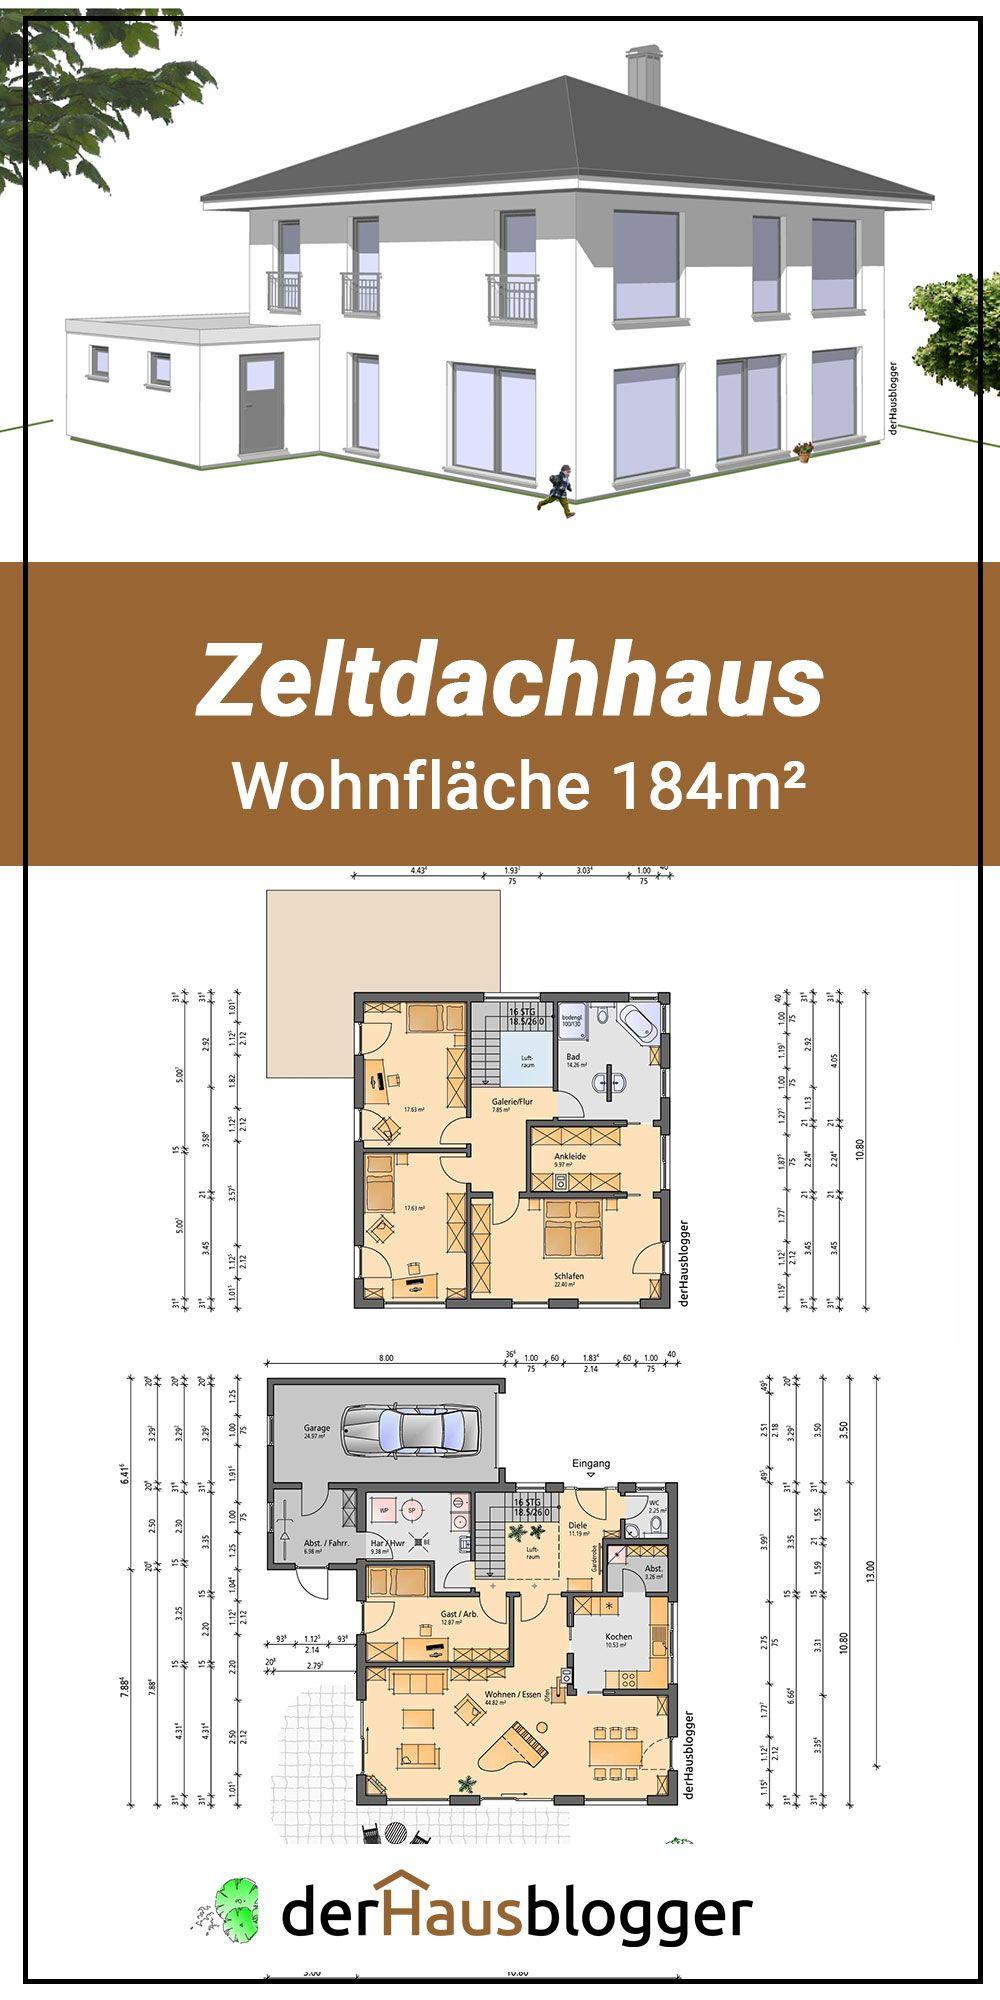 Photo of Grundriss Zeltdachhaus 184m2